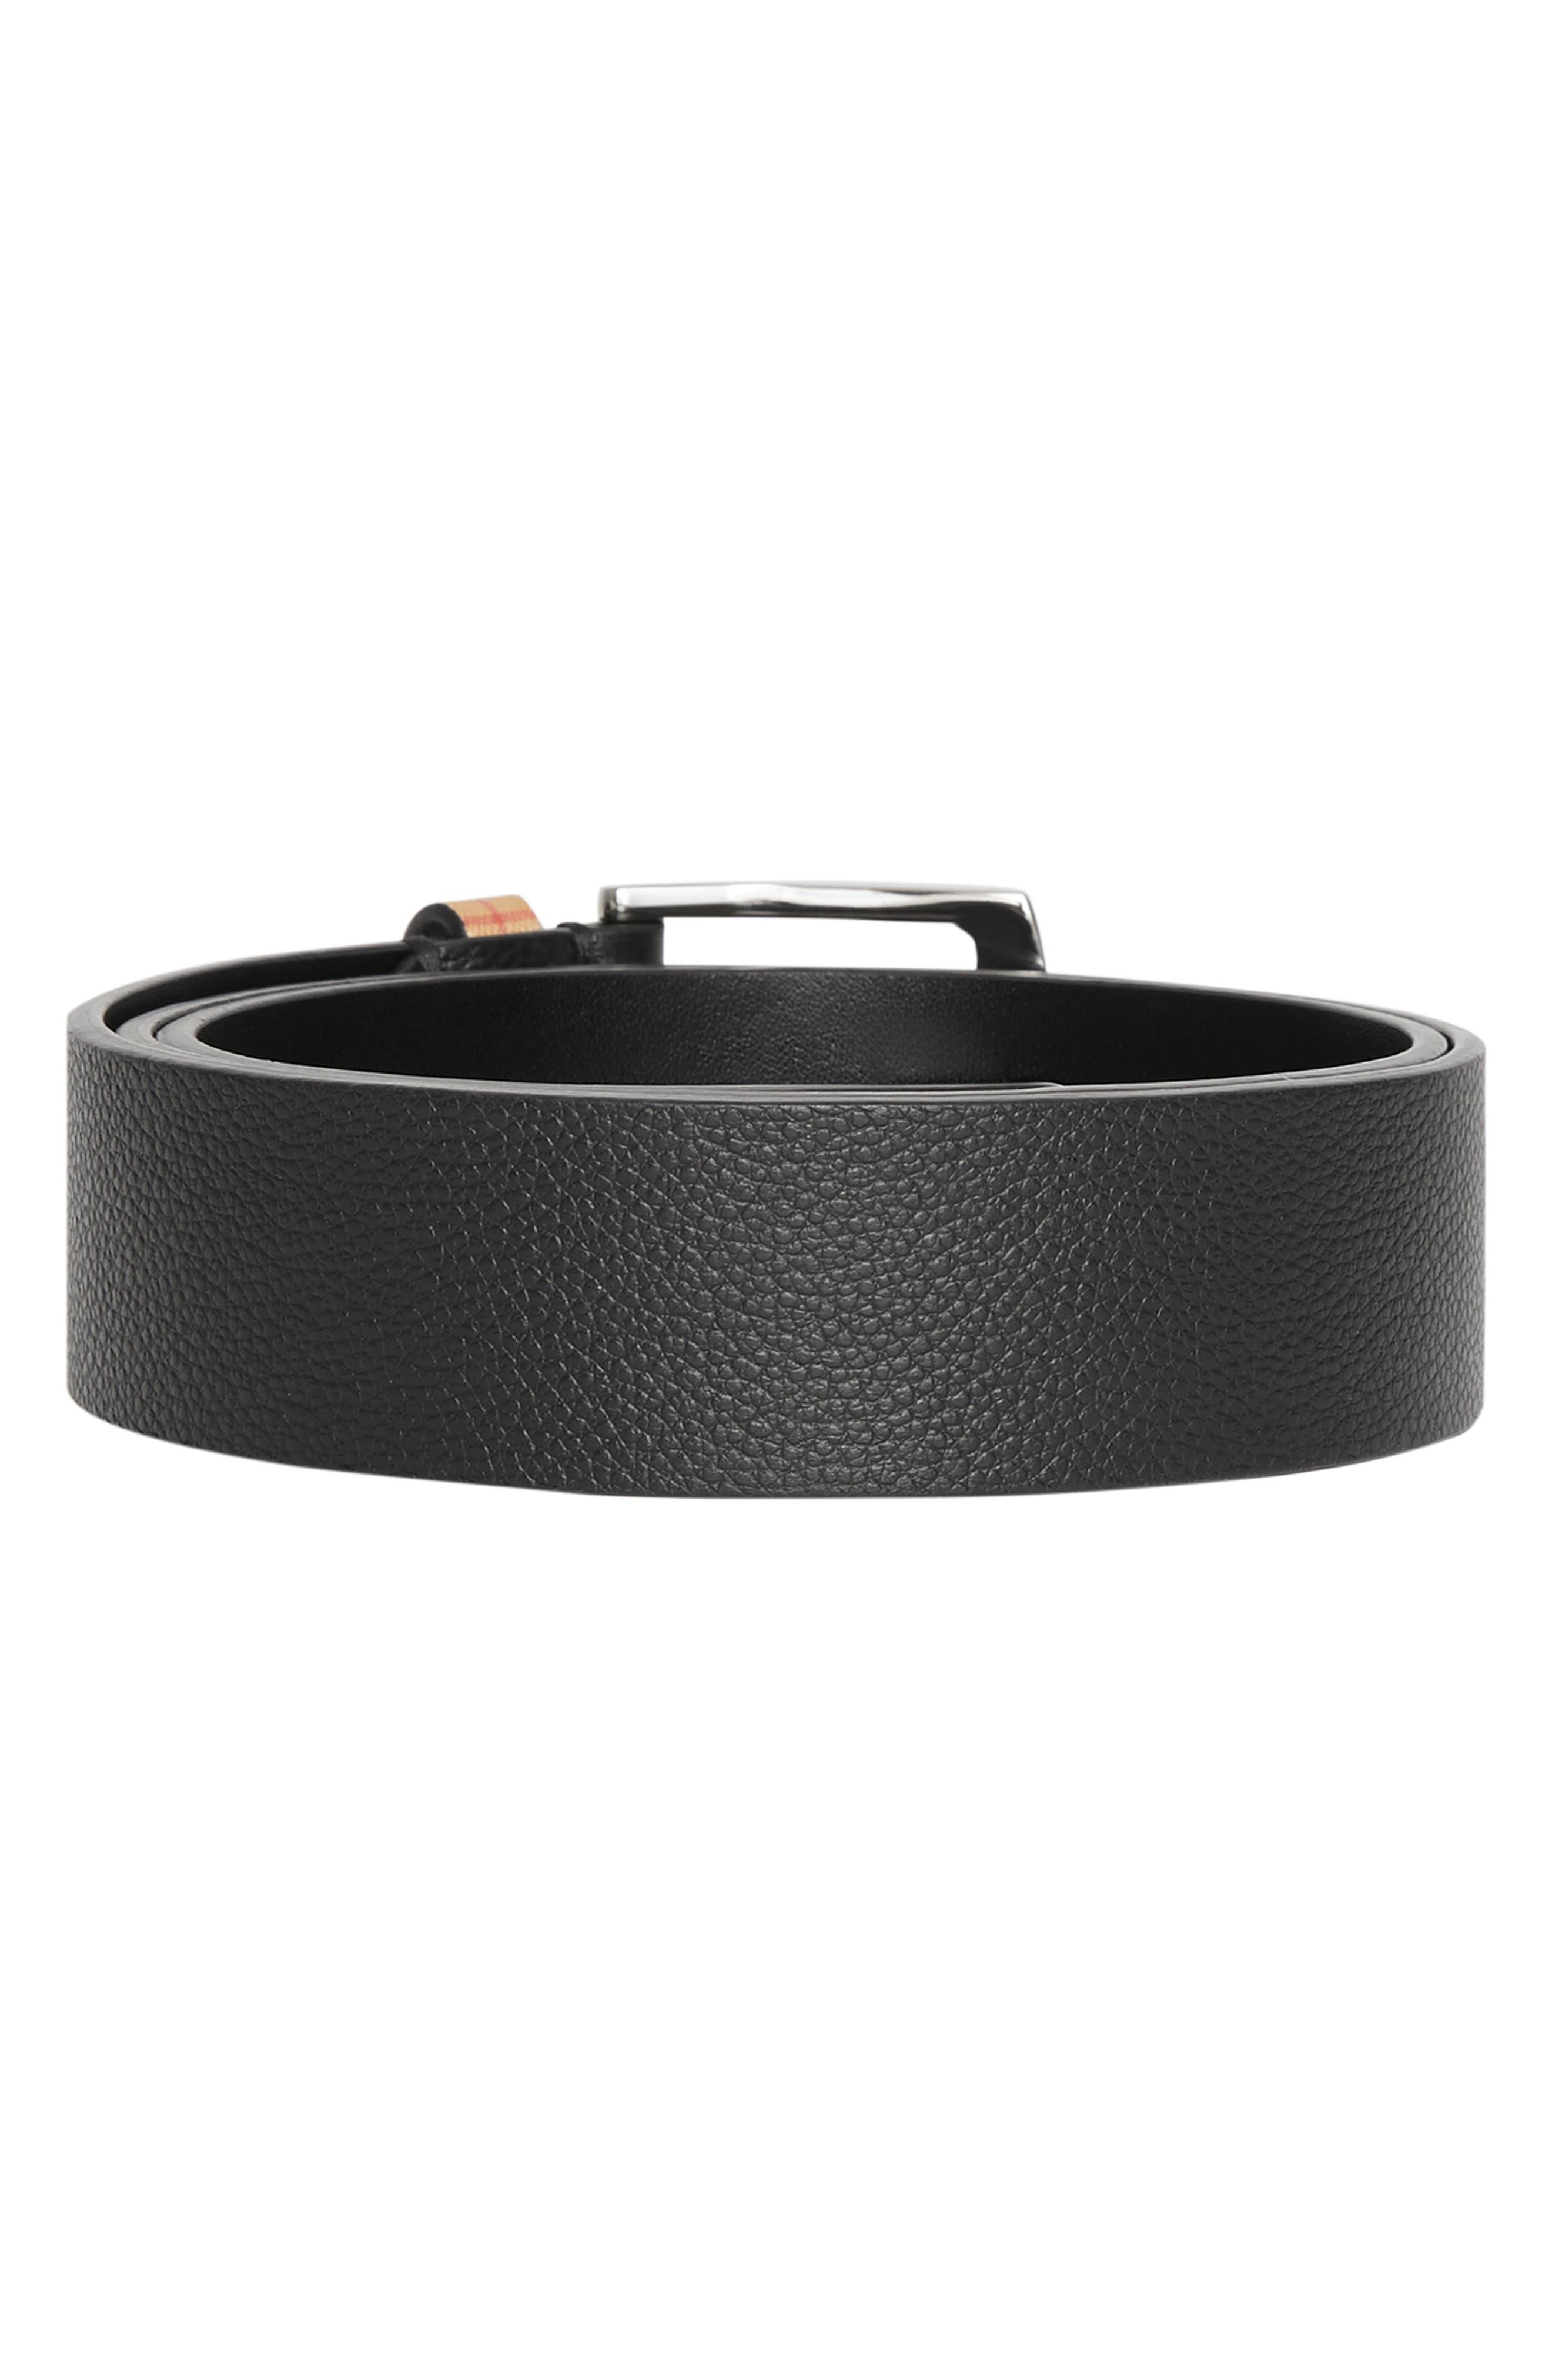 BURBERRY,                             Grainy Leather Belt,                             Alternate thumbnail 3, color,                             BLACK